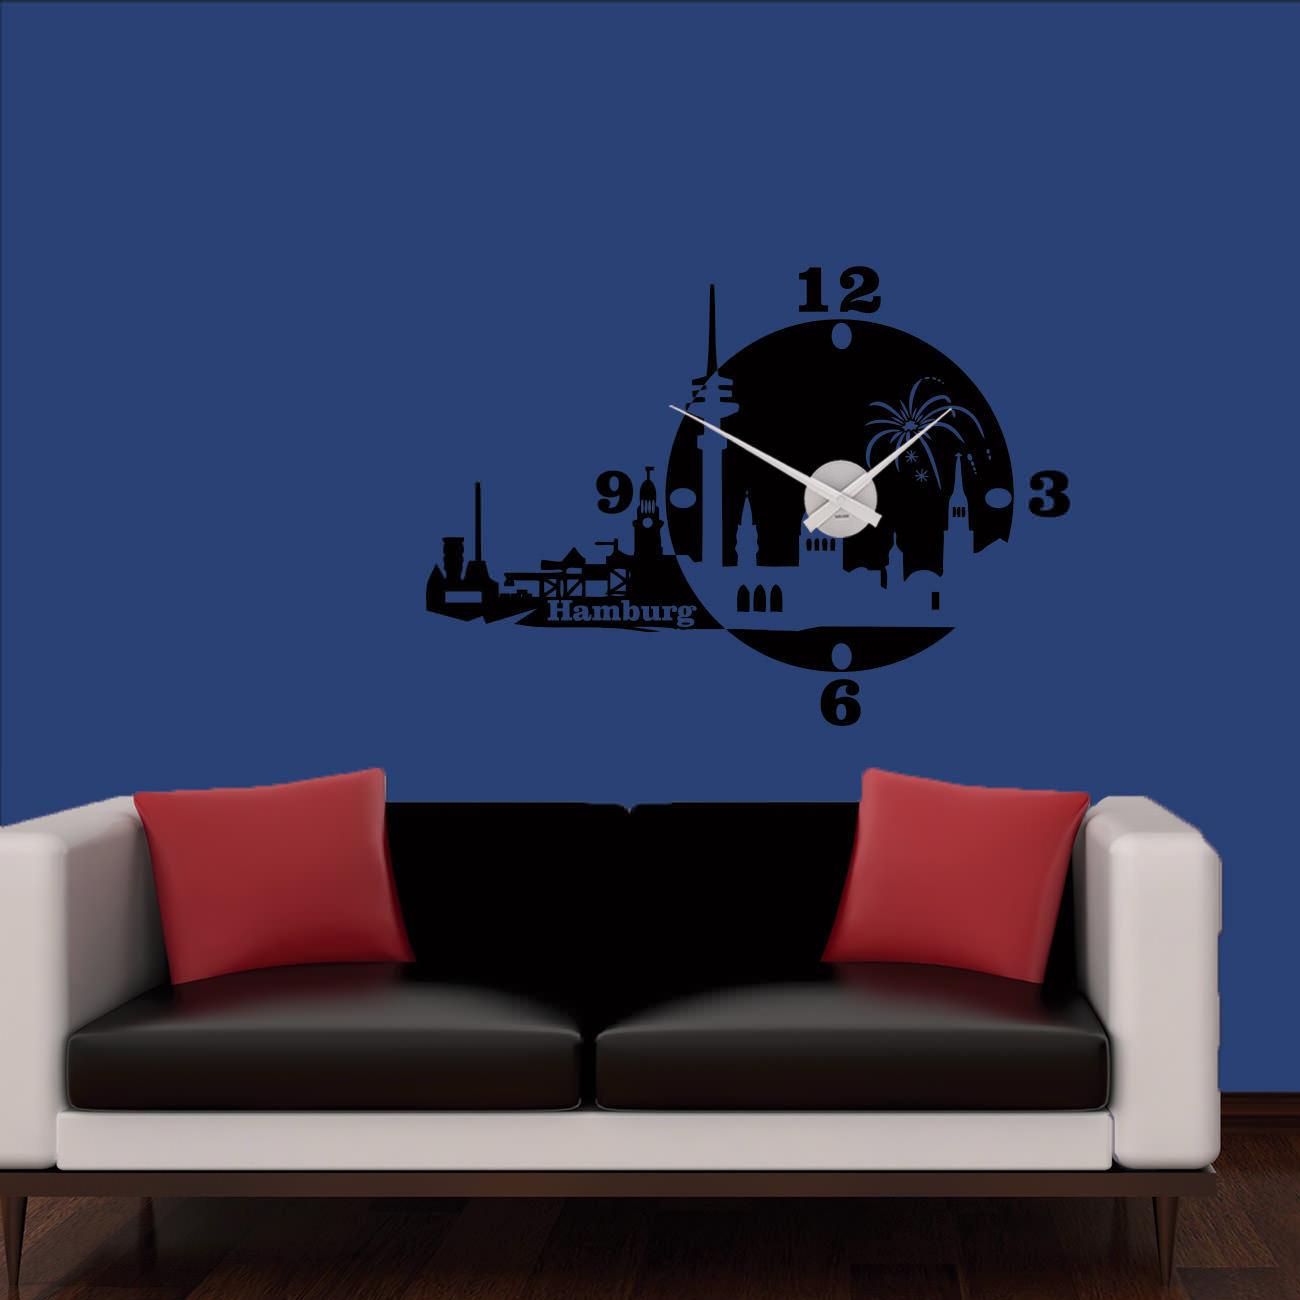 Mural Horloge Horloge Murale Karlsson Skyline Hambourg Horloge Ville +310+